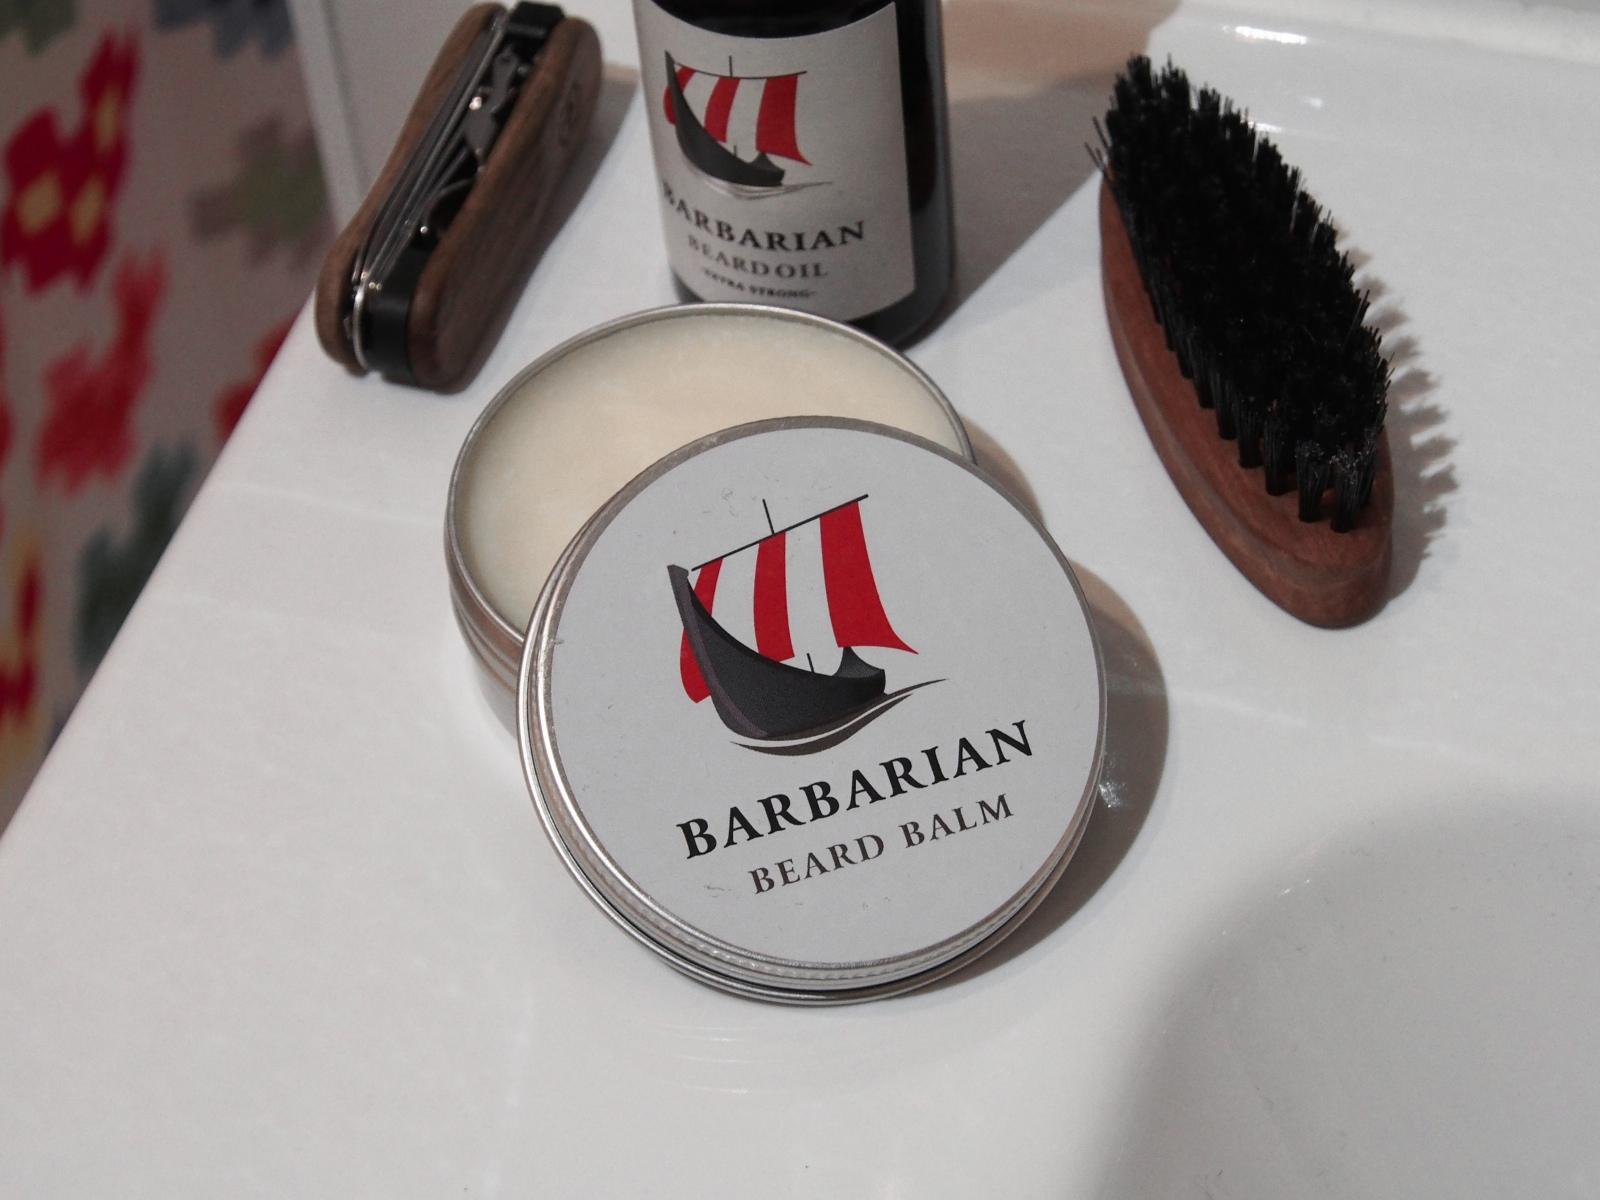 Barbarian Beard Balm (fotodinge.de)